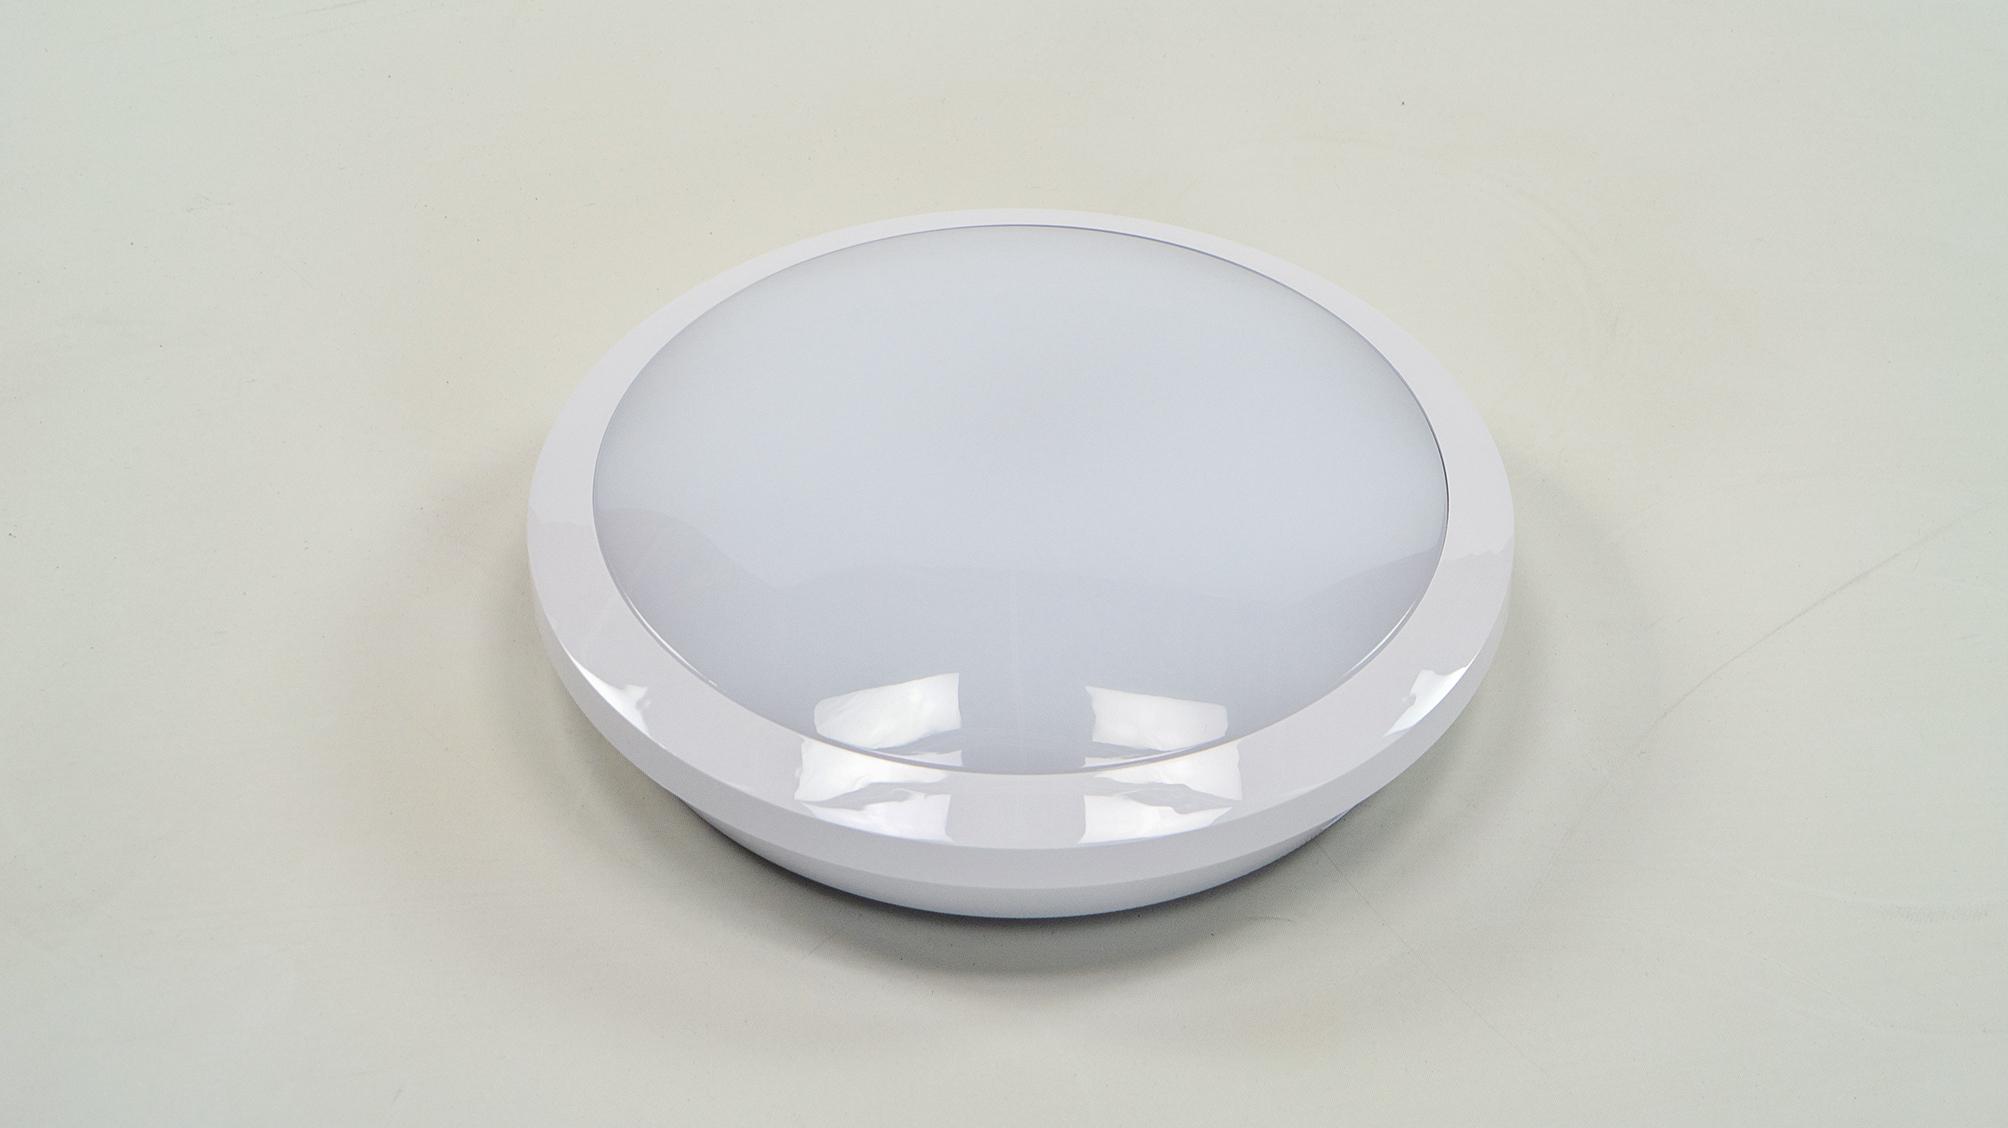 WELOOM BASIC LED BulkHead non-DIM 11/21W IP65+HFS